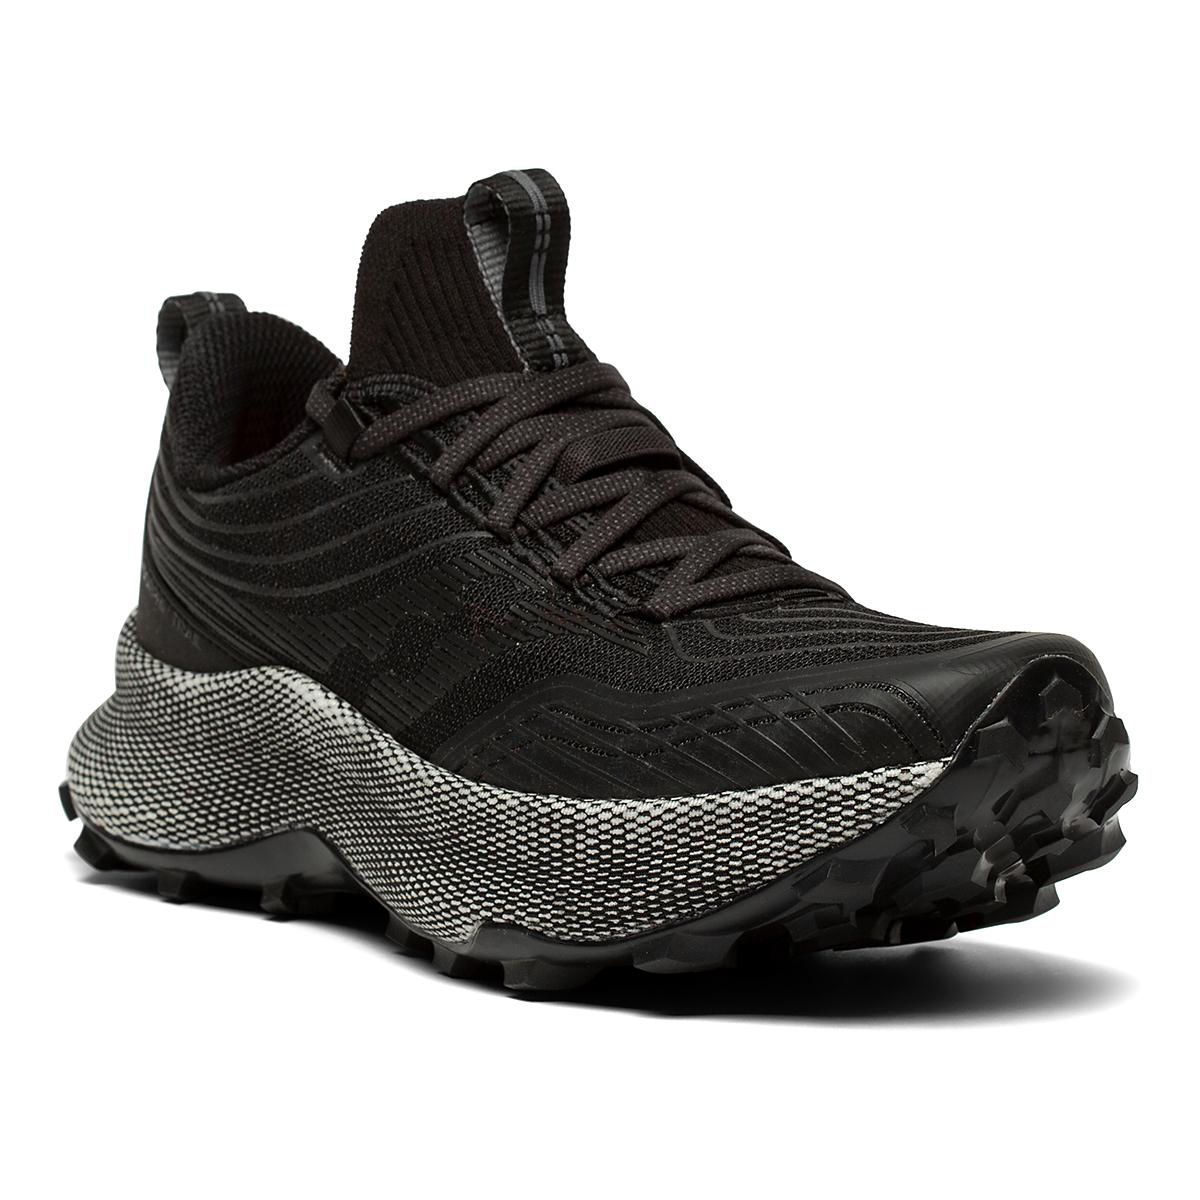 Women's Saucony Endorphin Trail Running Shoe - Color: Black/Gravel - Size: 5.5 - Width: Regular, Black/Gravel, large, image 5